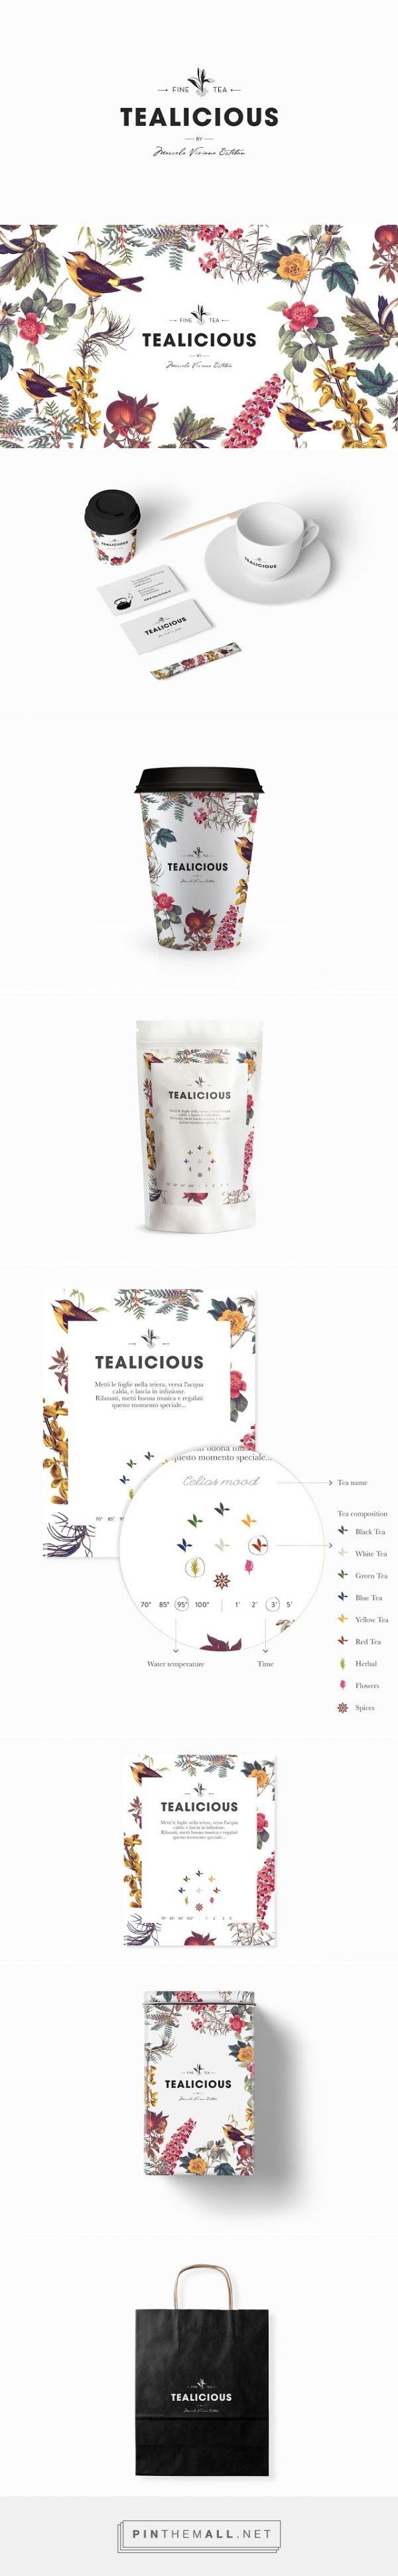 Tealicious #Tea Shop #packaging designed by Alvarez Juana - http://www.packagingoftheworld.com/2015/03/tealicious.html